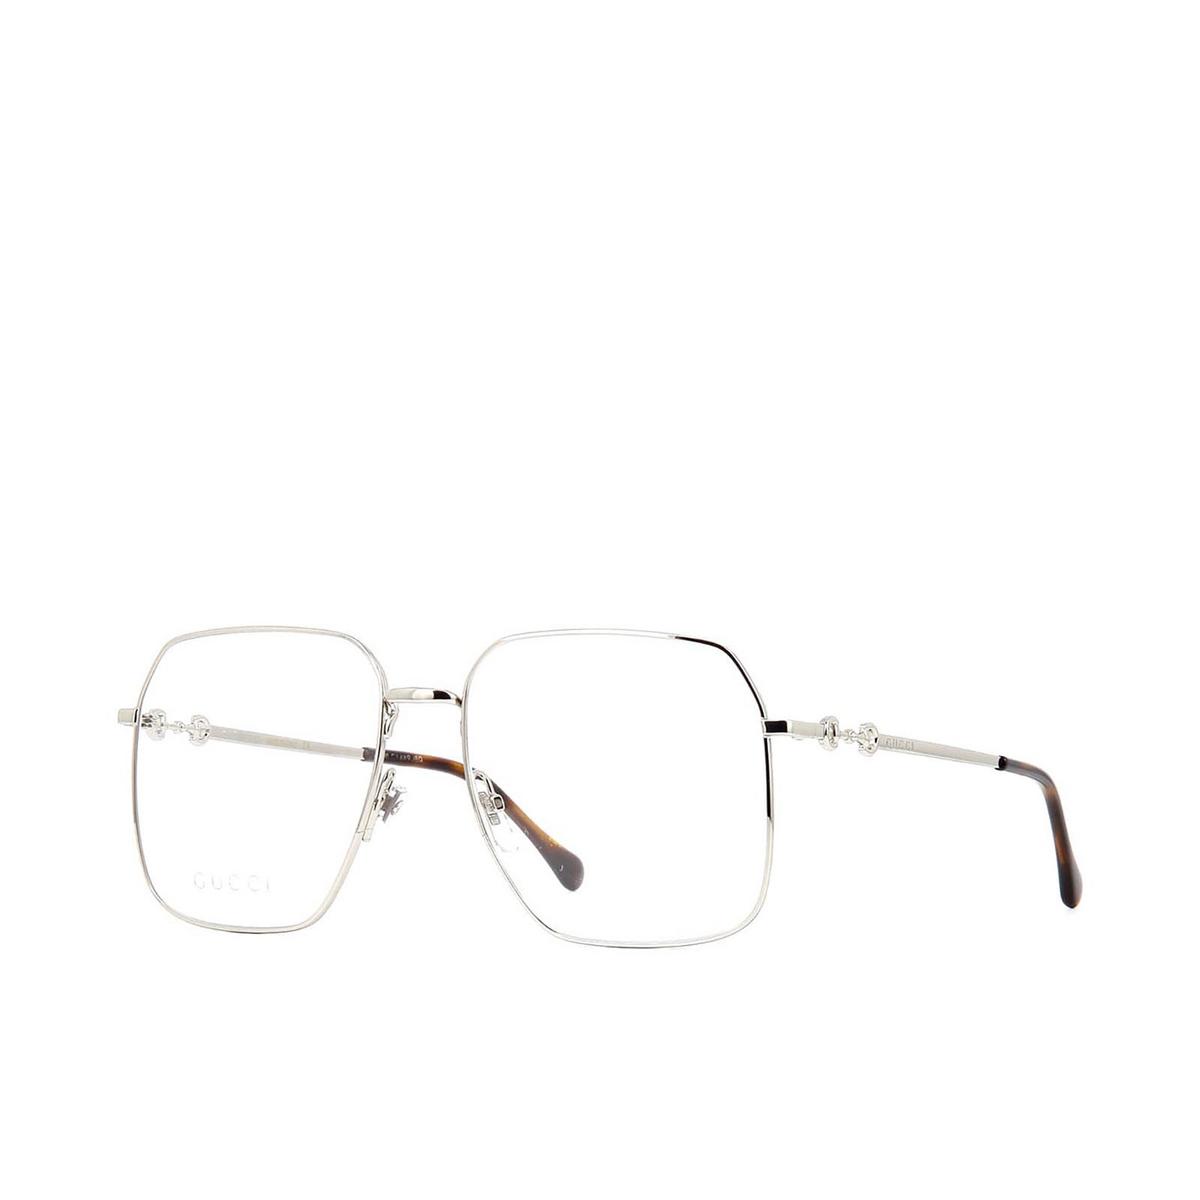 Gucci® Square Eyeglasses: GG0952O color Silver 003 - three-quarters view.